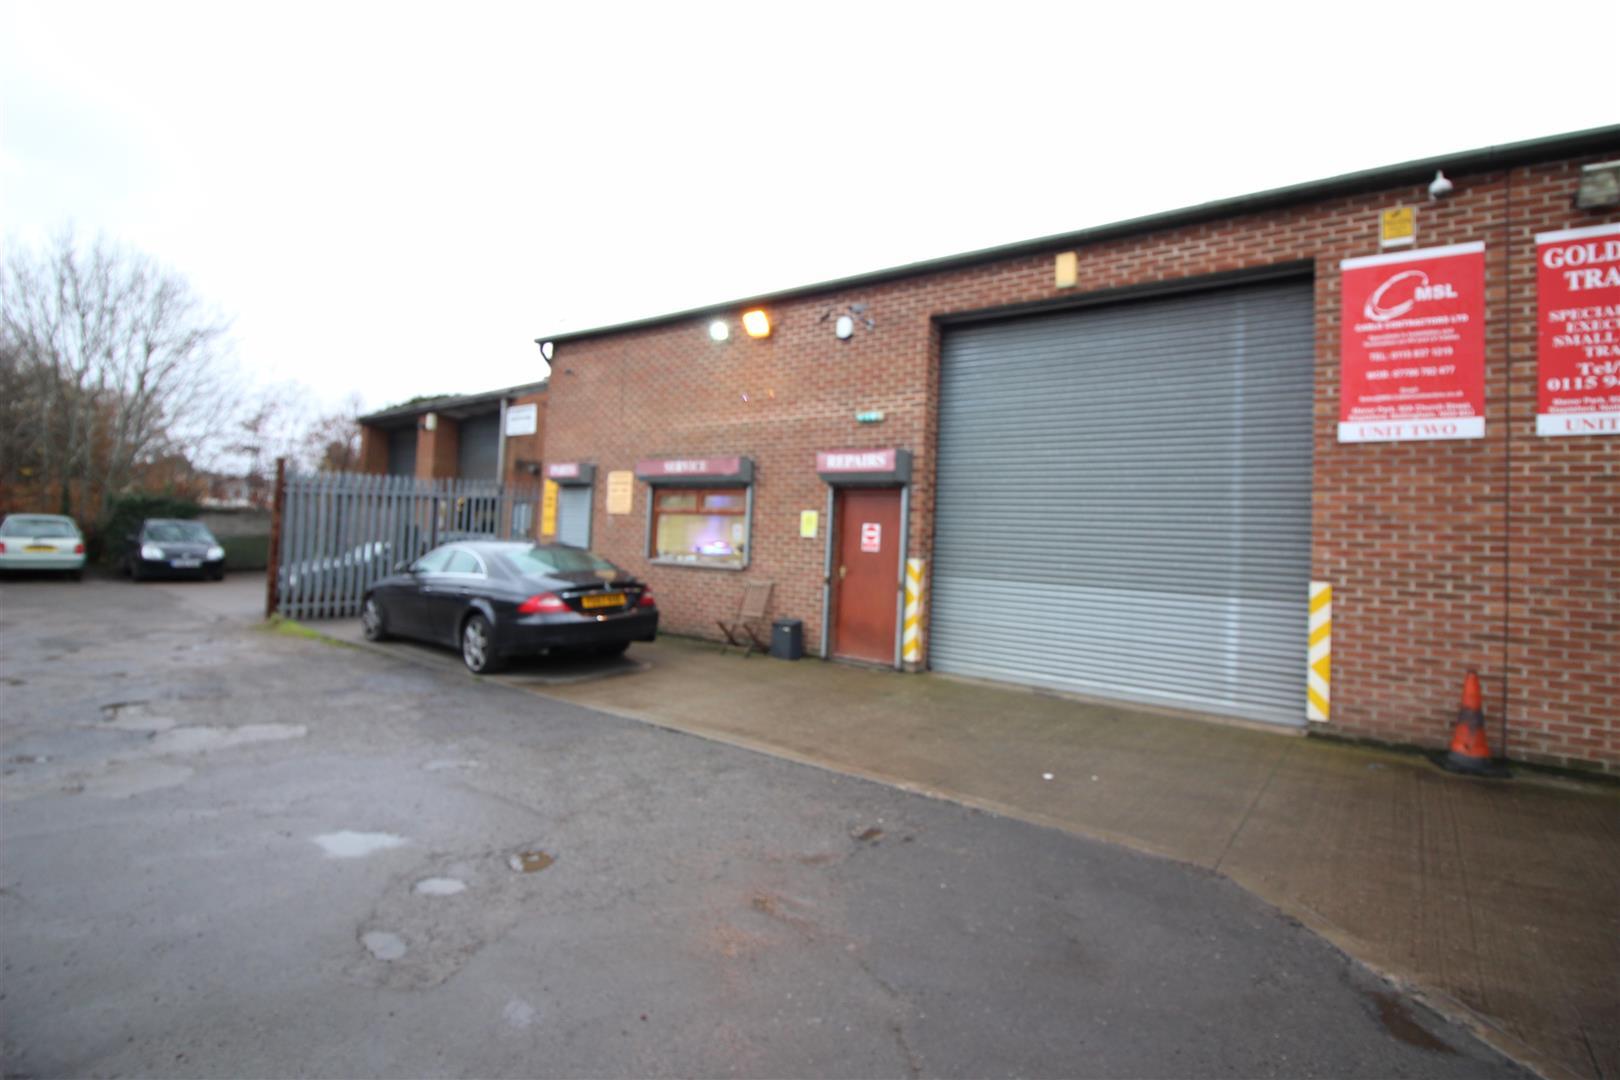 Commercial Property for sale in Church Street, Stapleford, Nottingham